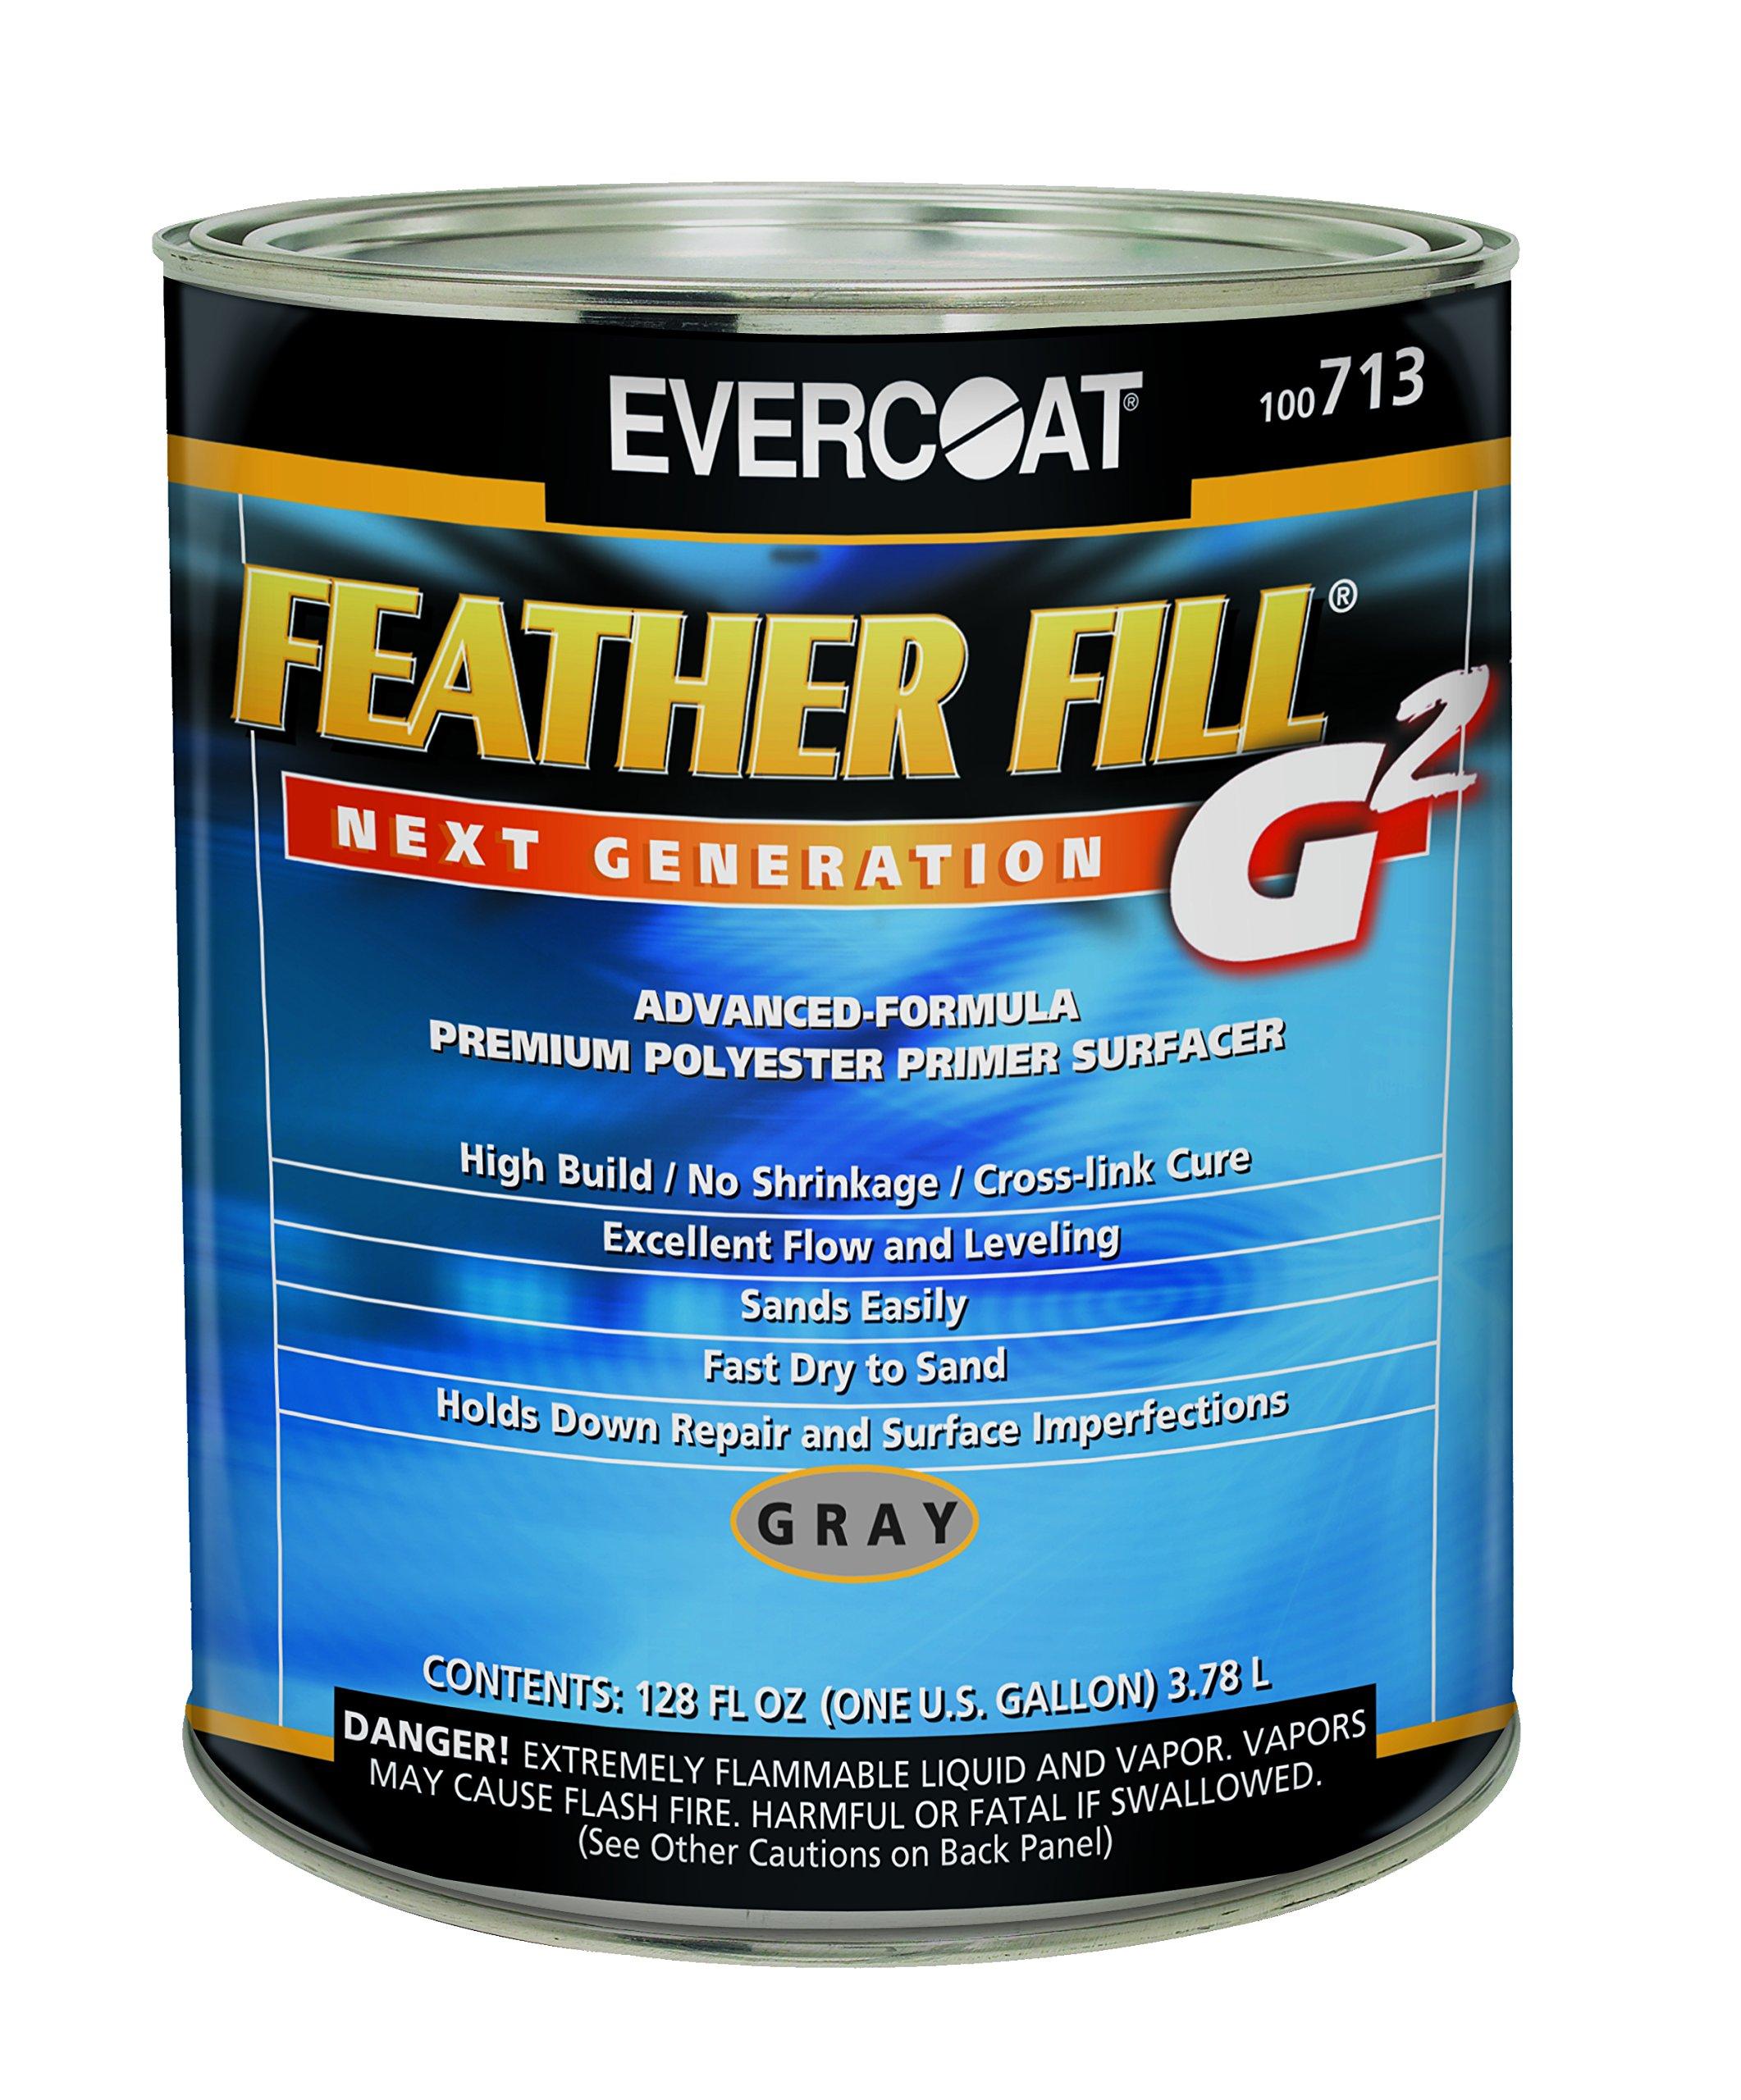 Evercoat 713 Gray Feather Fill G2 Primer - 1 Gallon